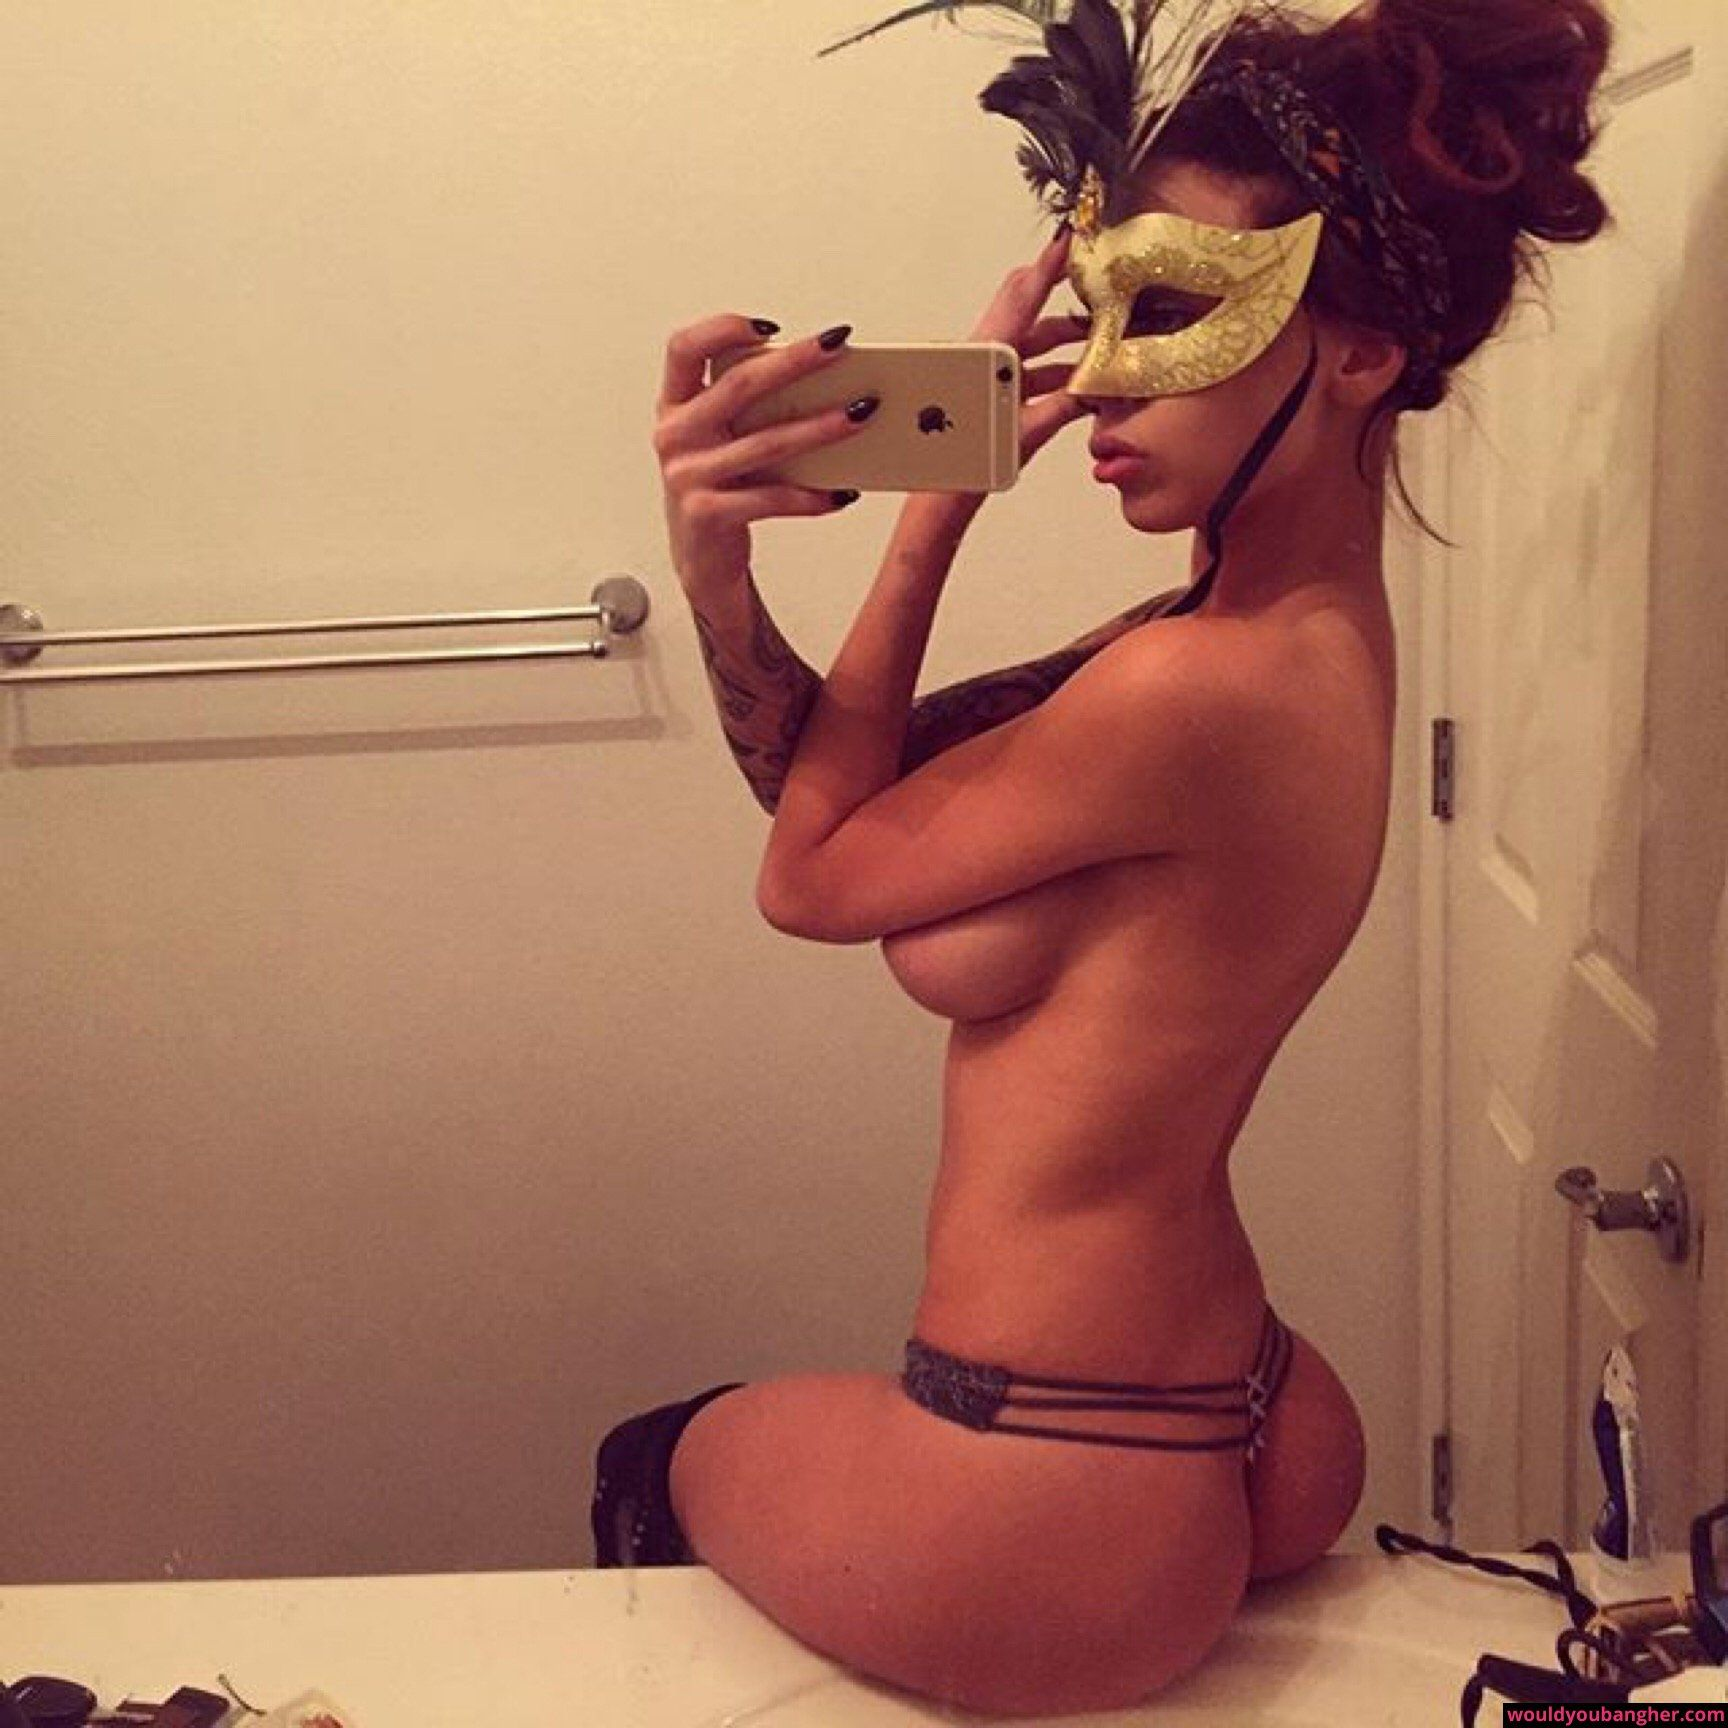 sexy bathroom selfies